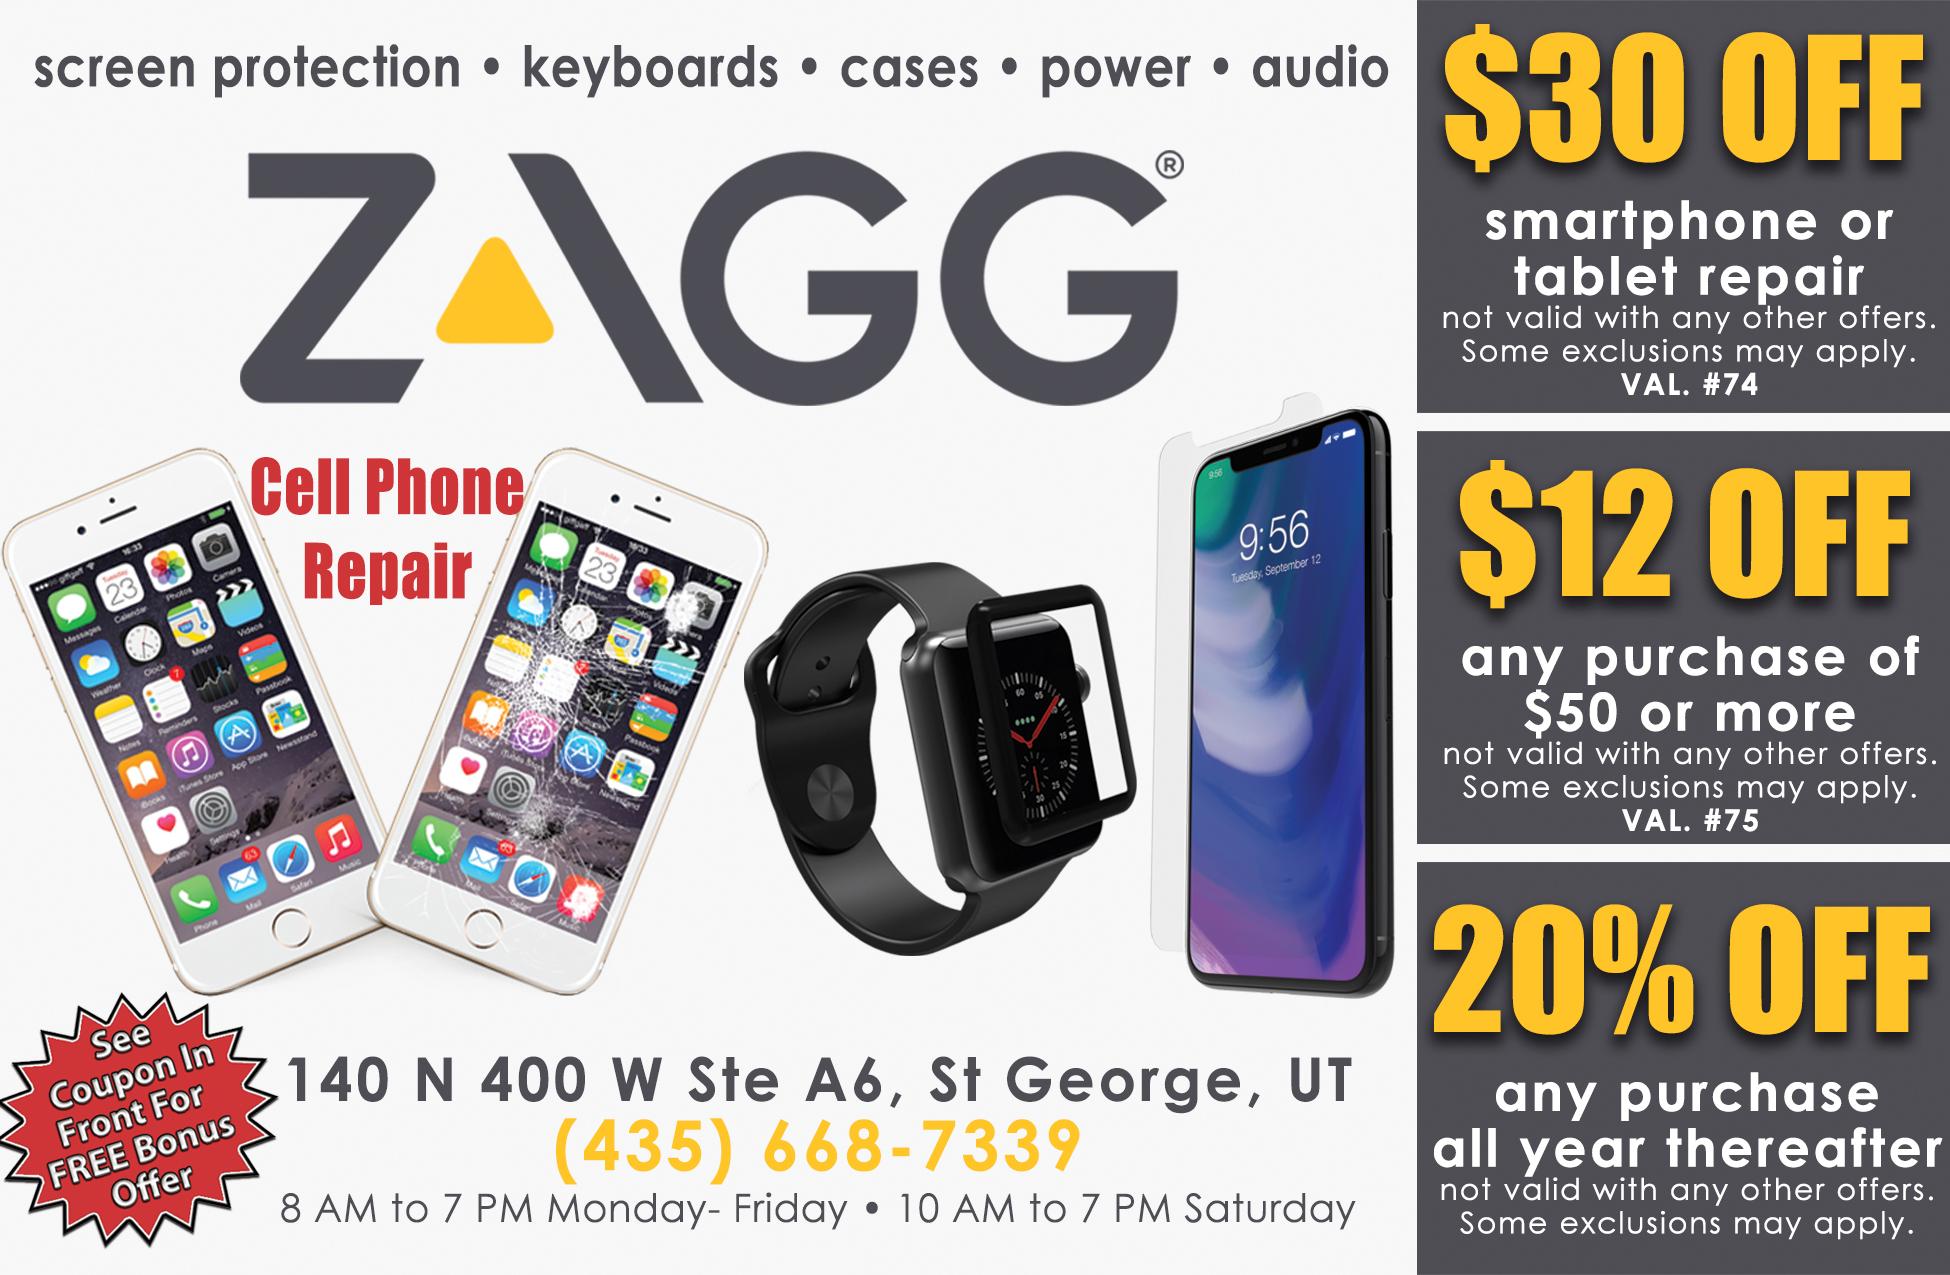 Zagg | Dixie Direct Savings Guide pertaining to Zagg Dino Crossing